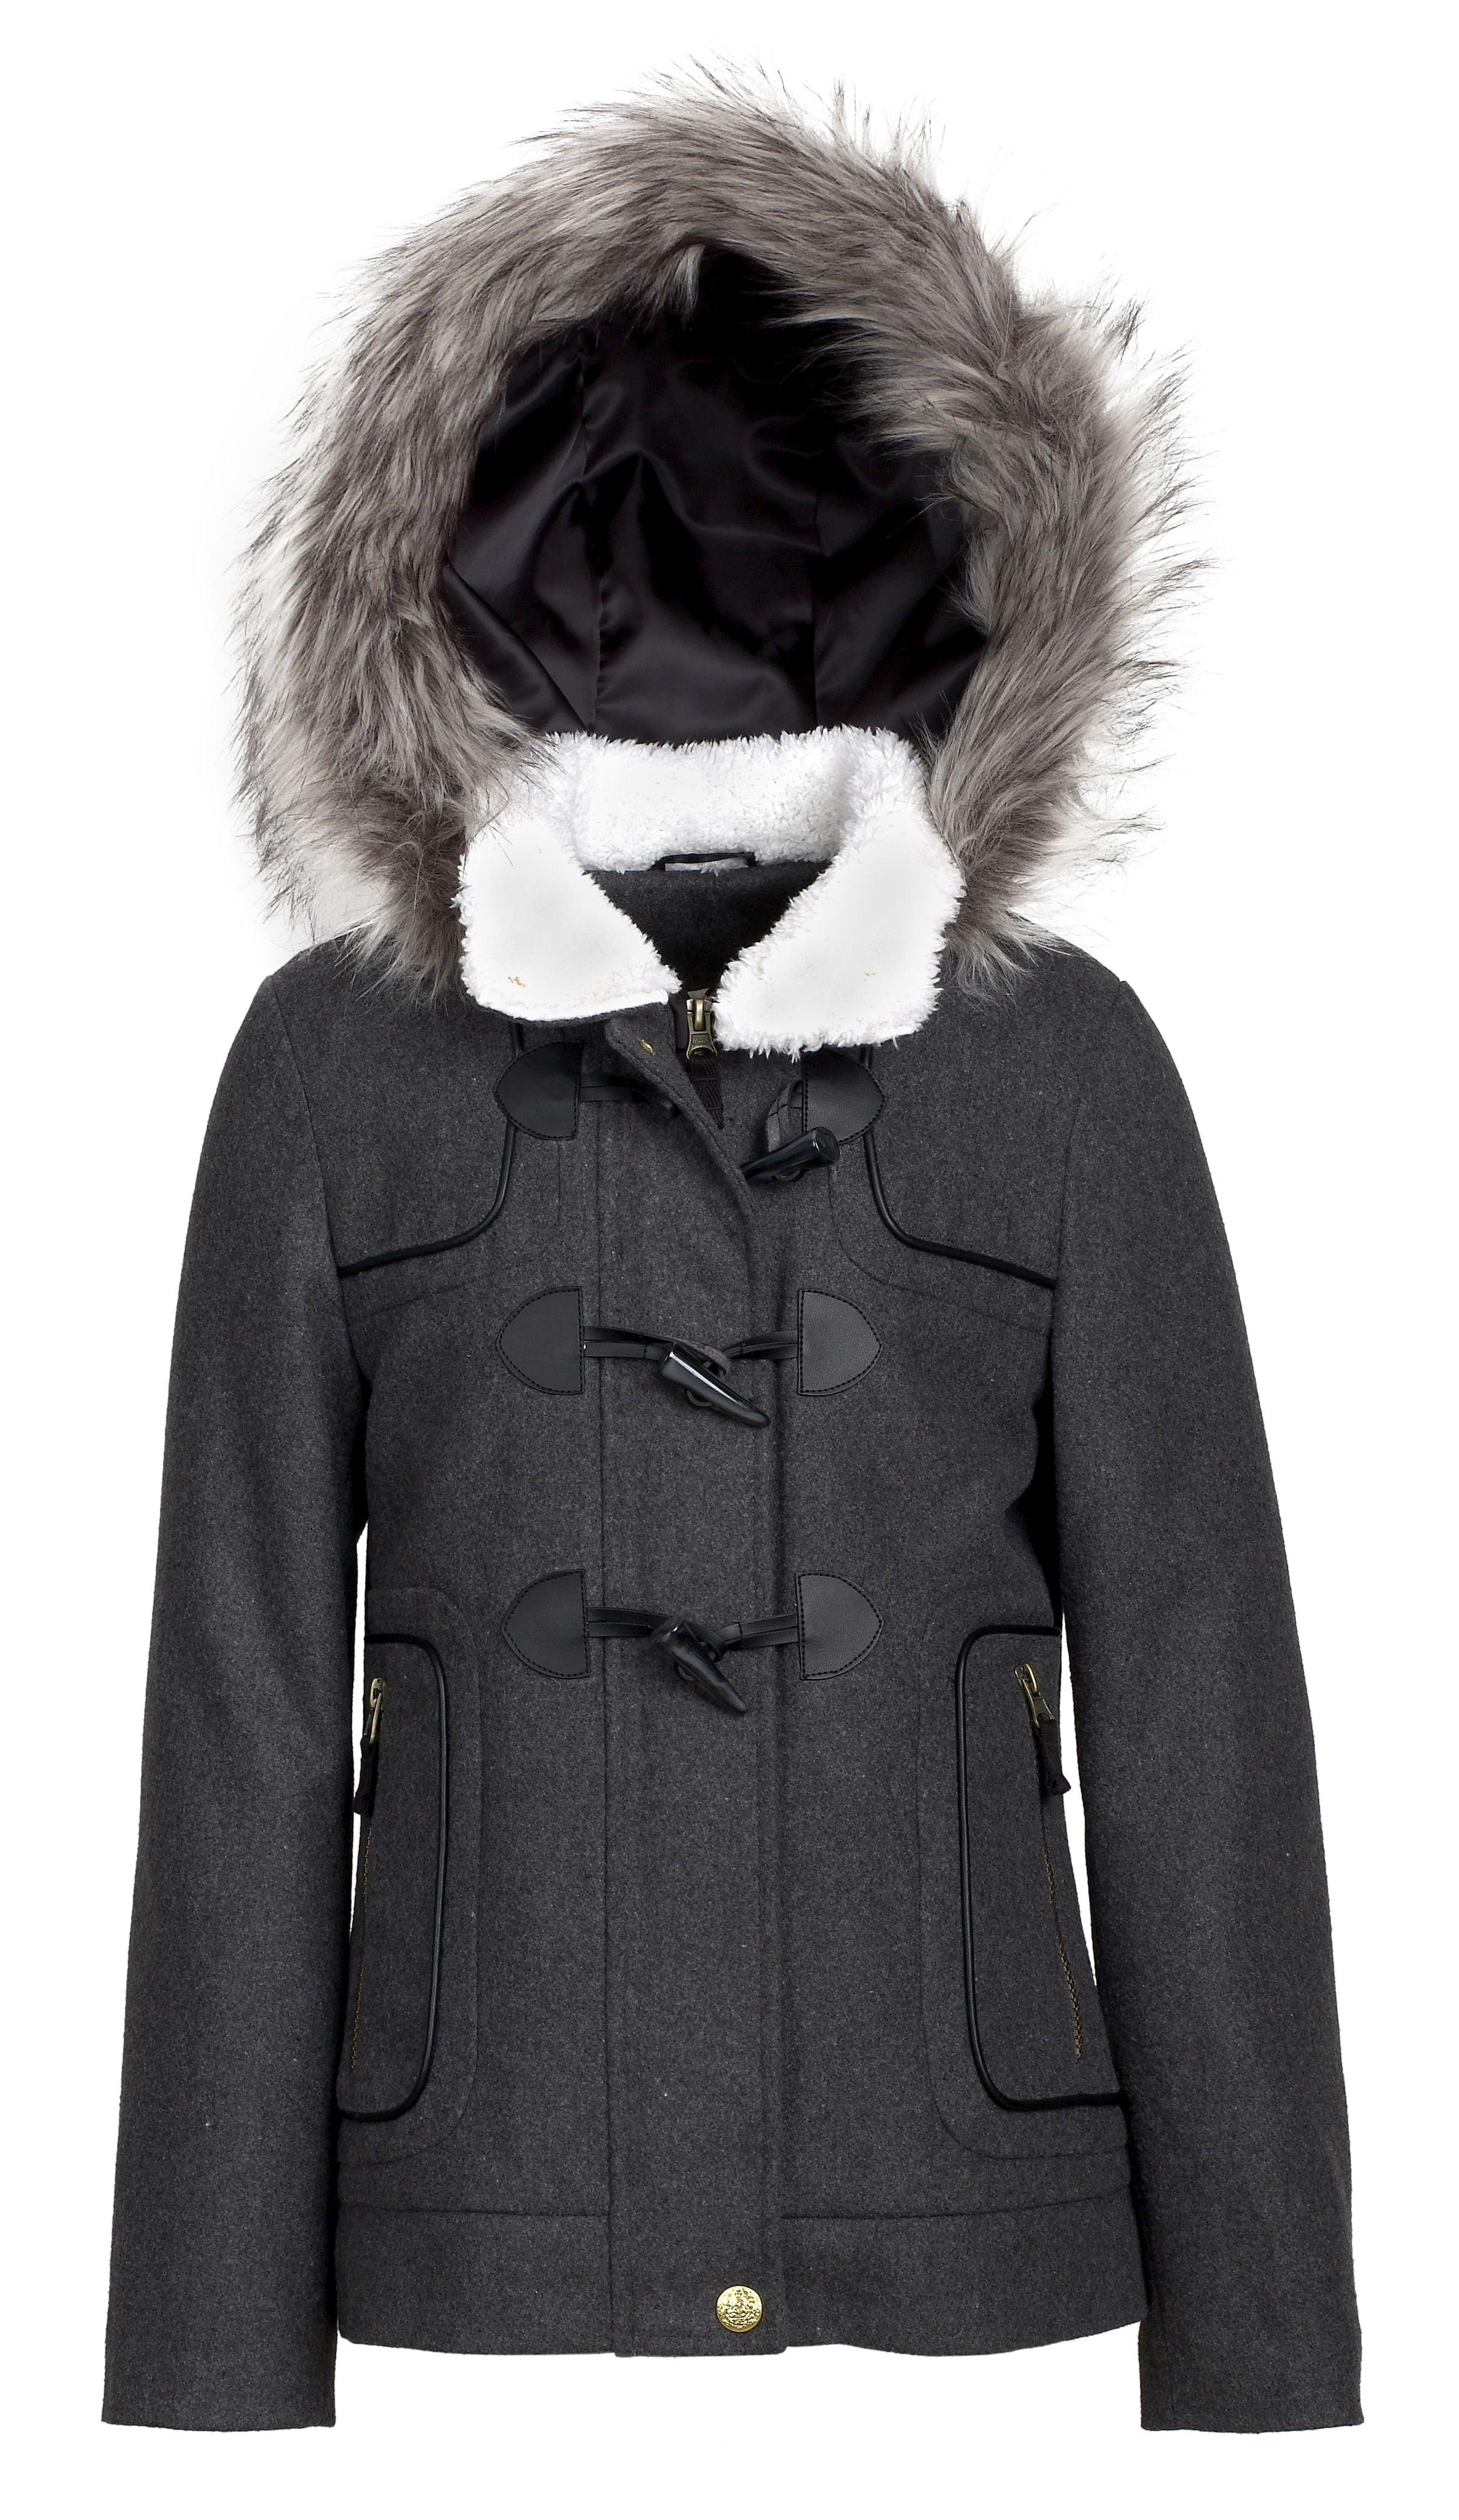 055206261 London Fog - London Fog Girls Classic Wool Blend Hooded Winter ...